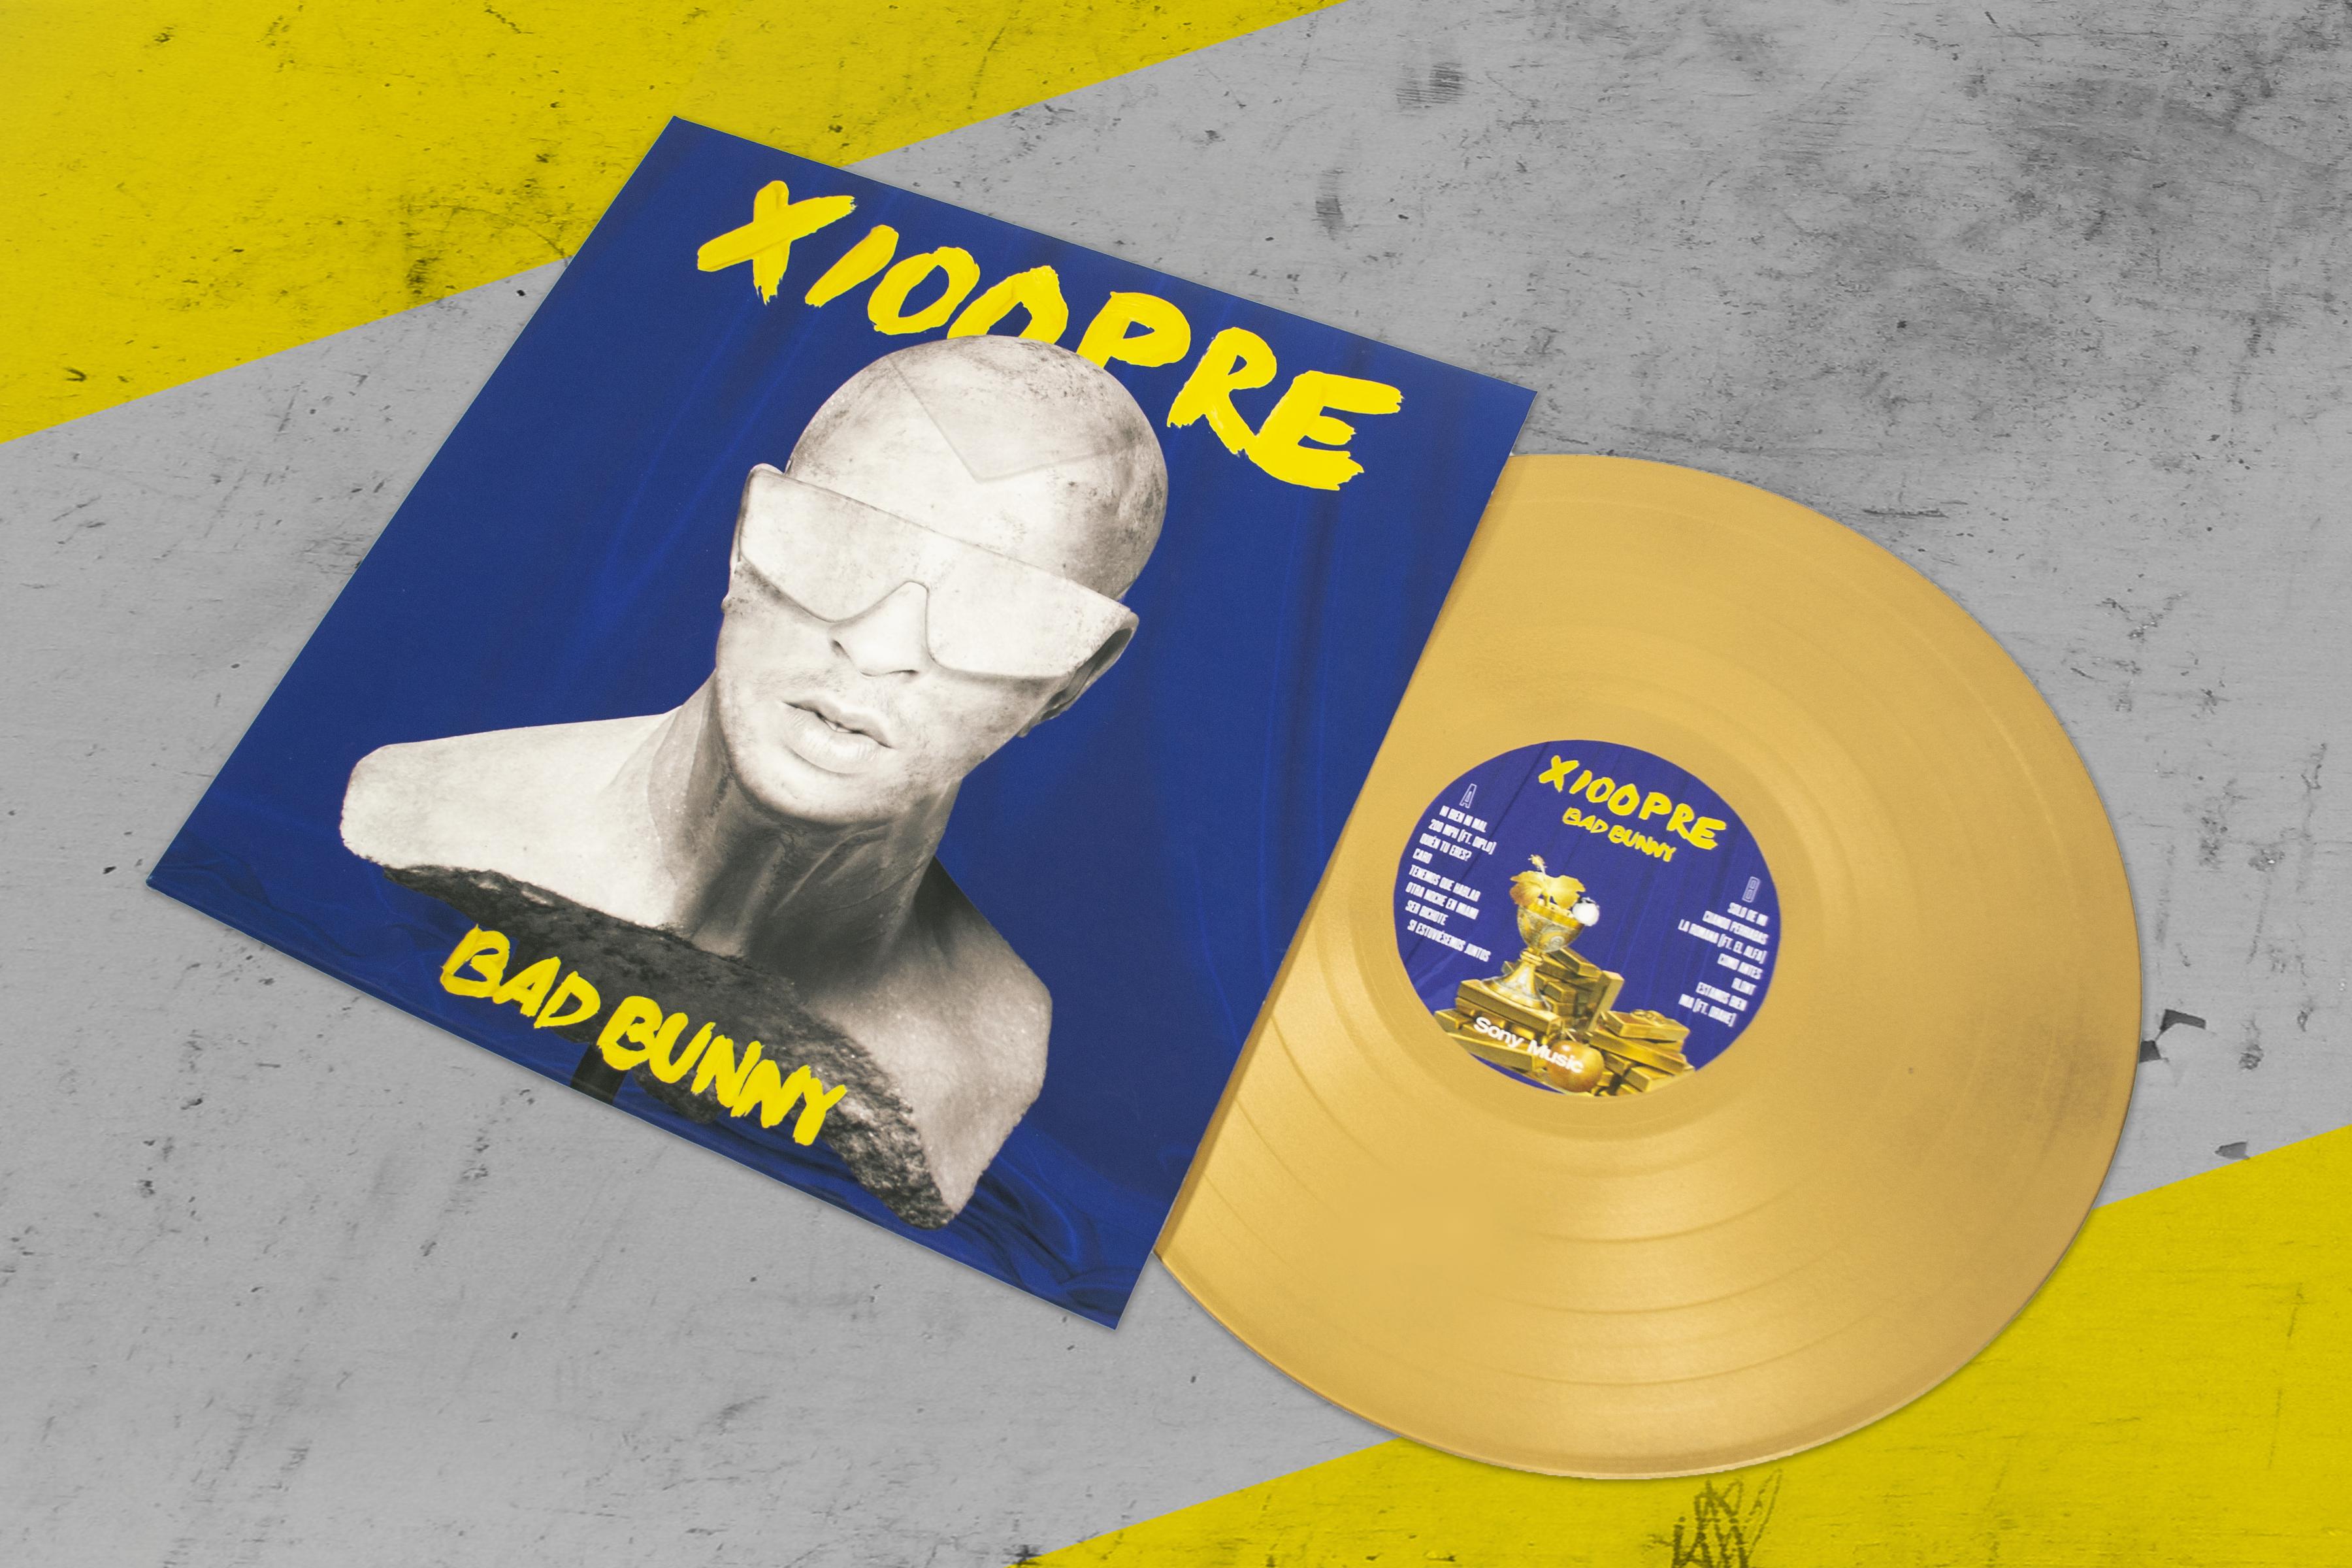 Bad-Bunny-X100PRE-kimberly-ramirez